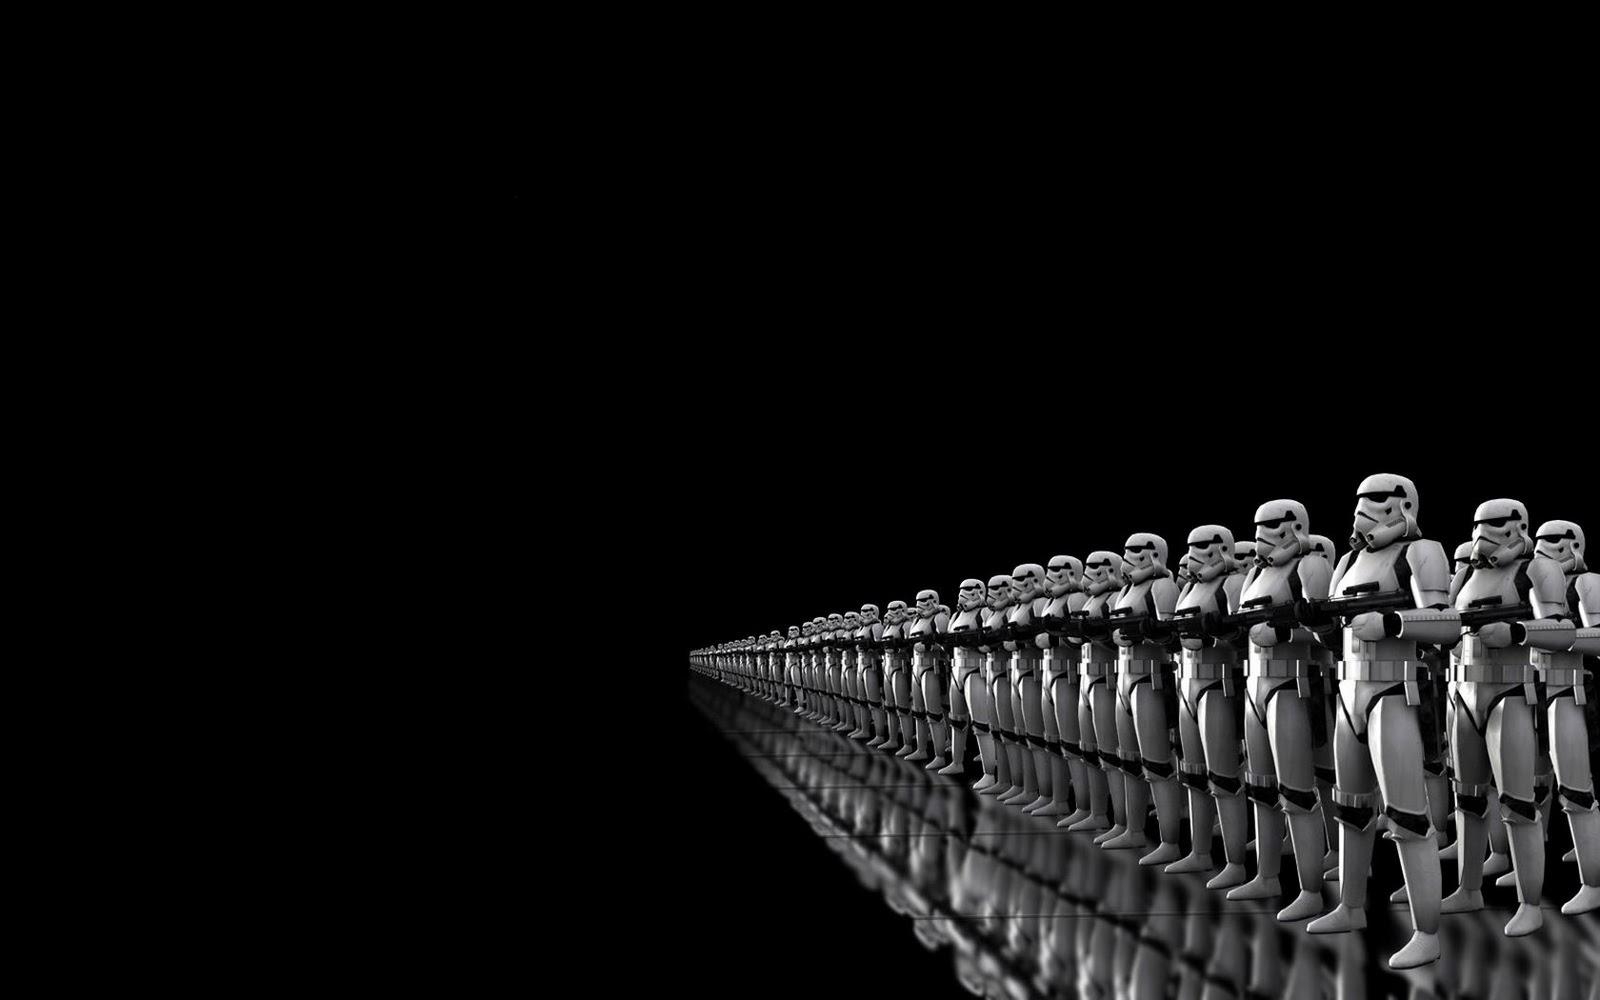 Star Wars Wallpaper Picture Seen On coolpicturegalleryblogspotcom 1600x1000